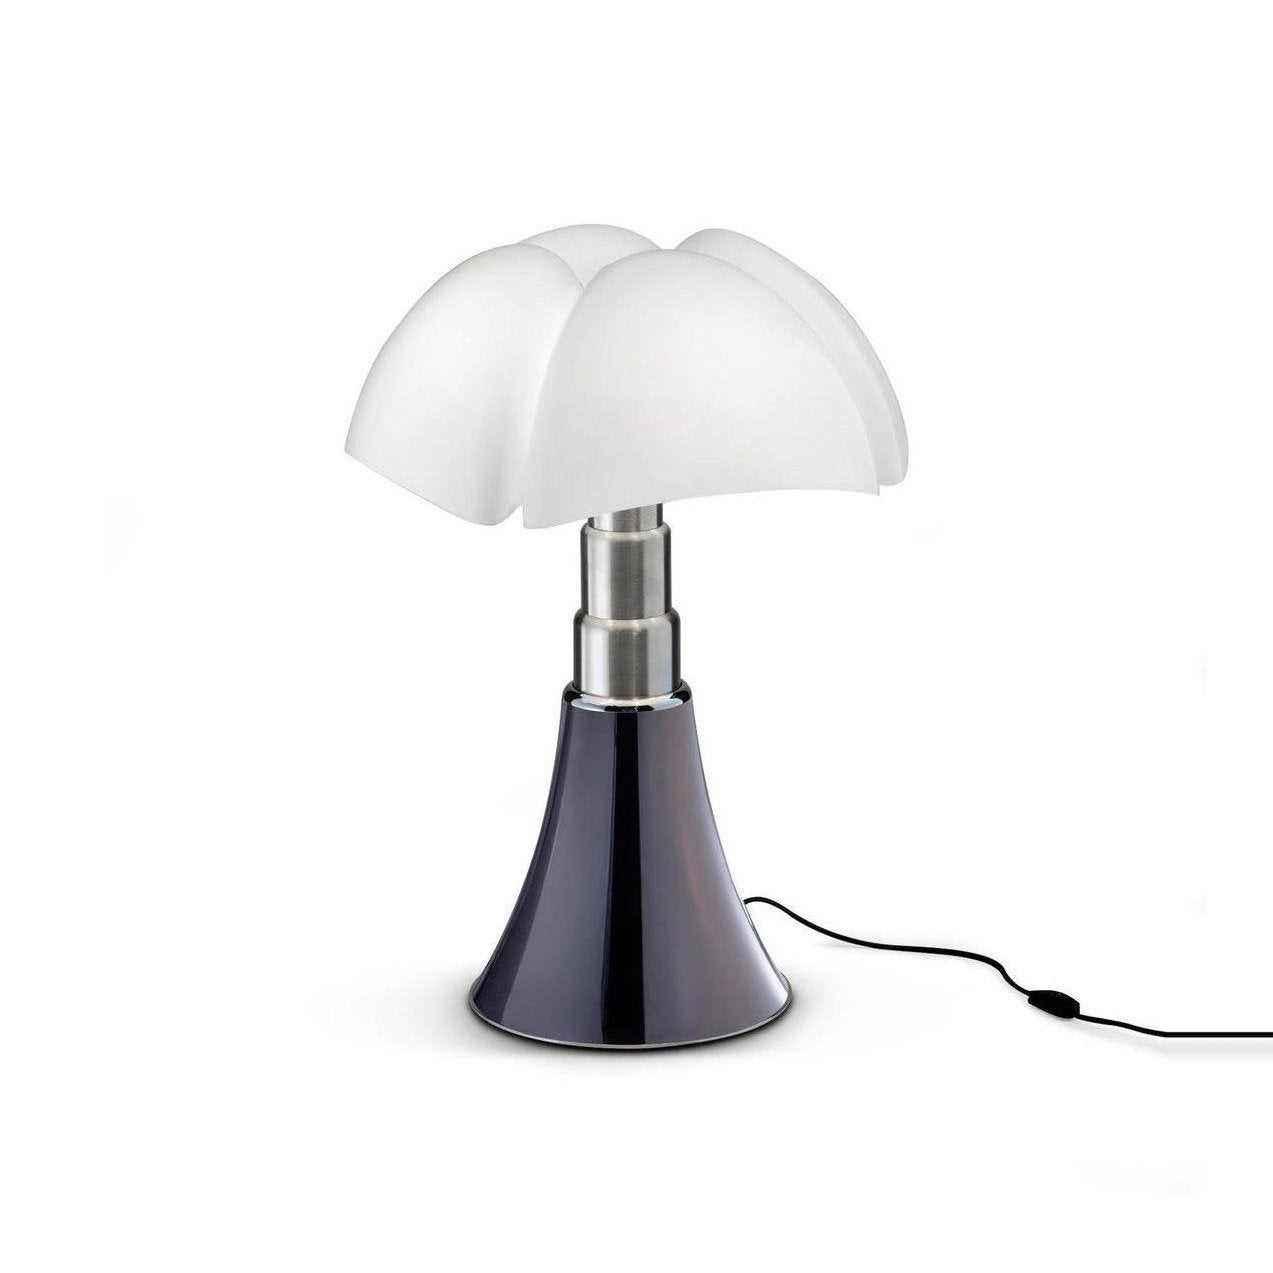 Lampe, design, métal, MARTINELLI LUCE Mini pipistrello gris